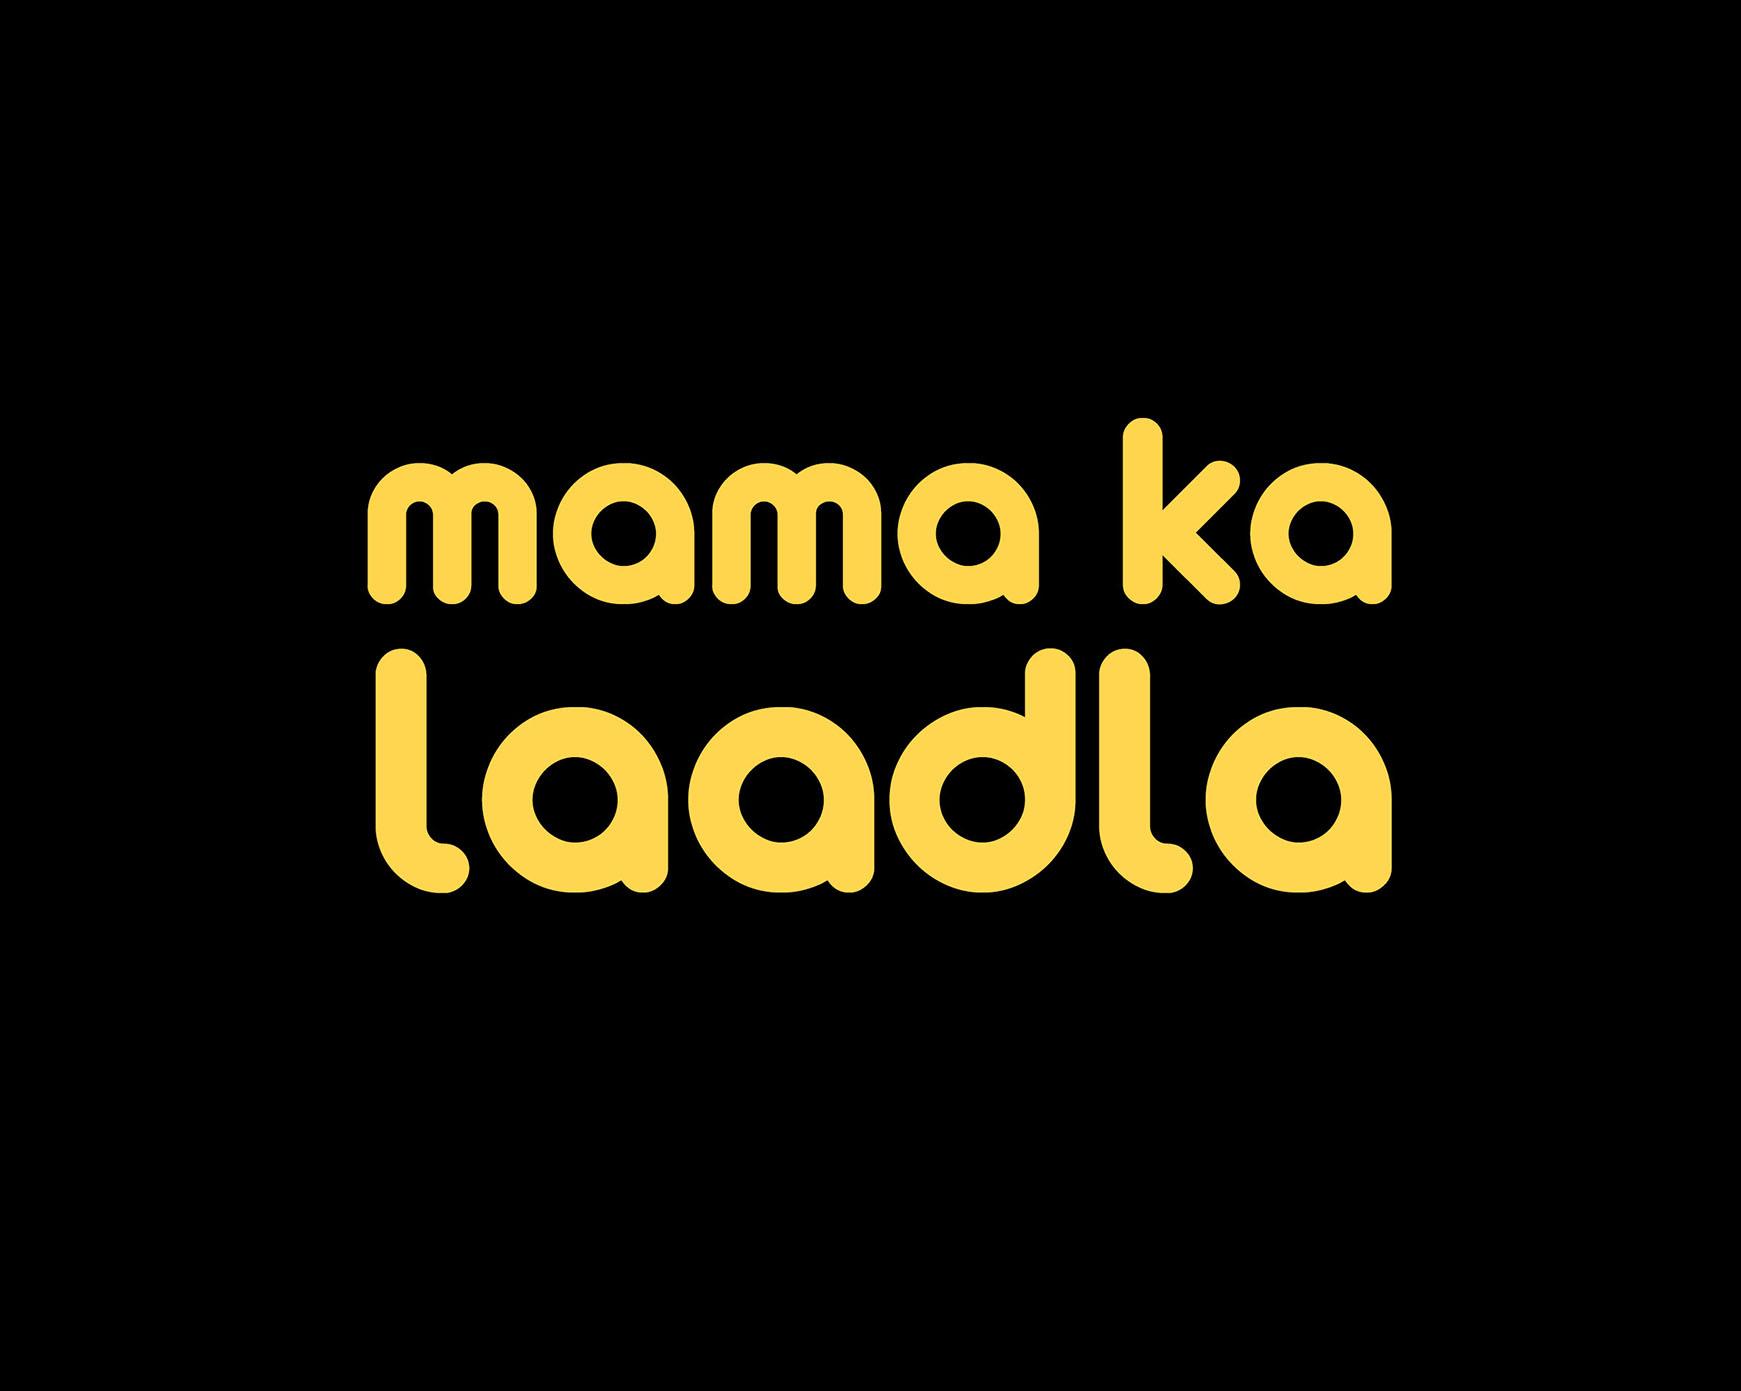 228-MAMA-KA-LAADLA.jpg